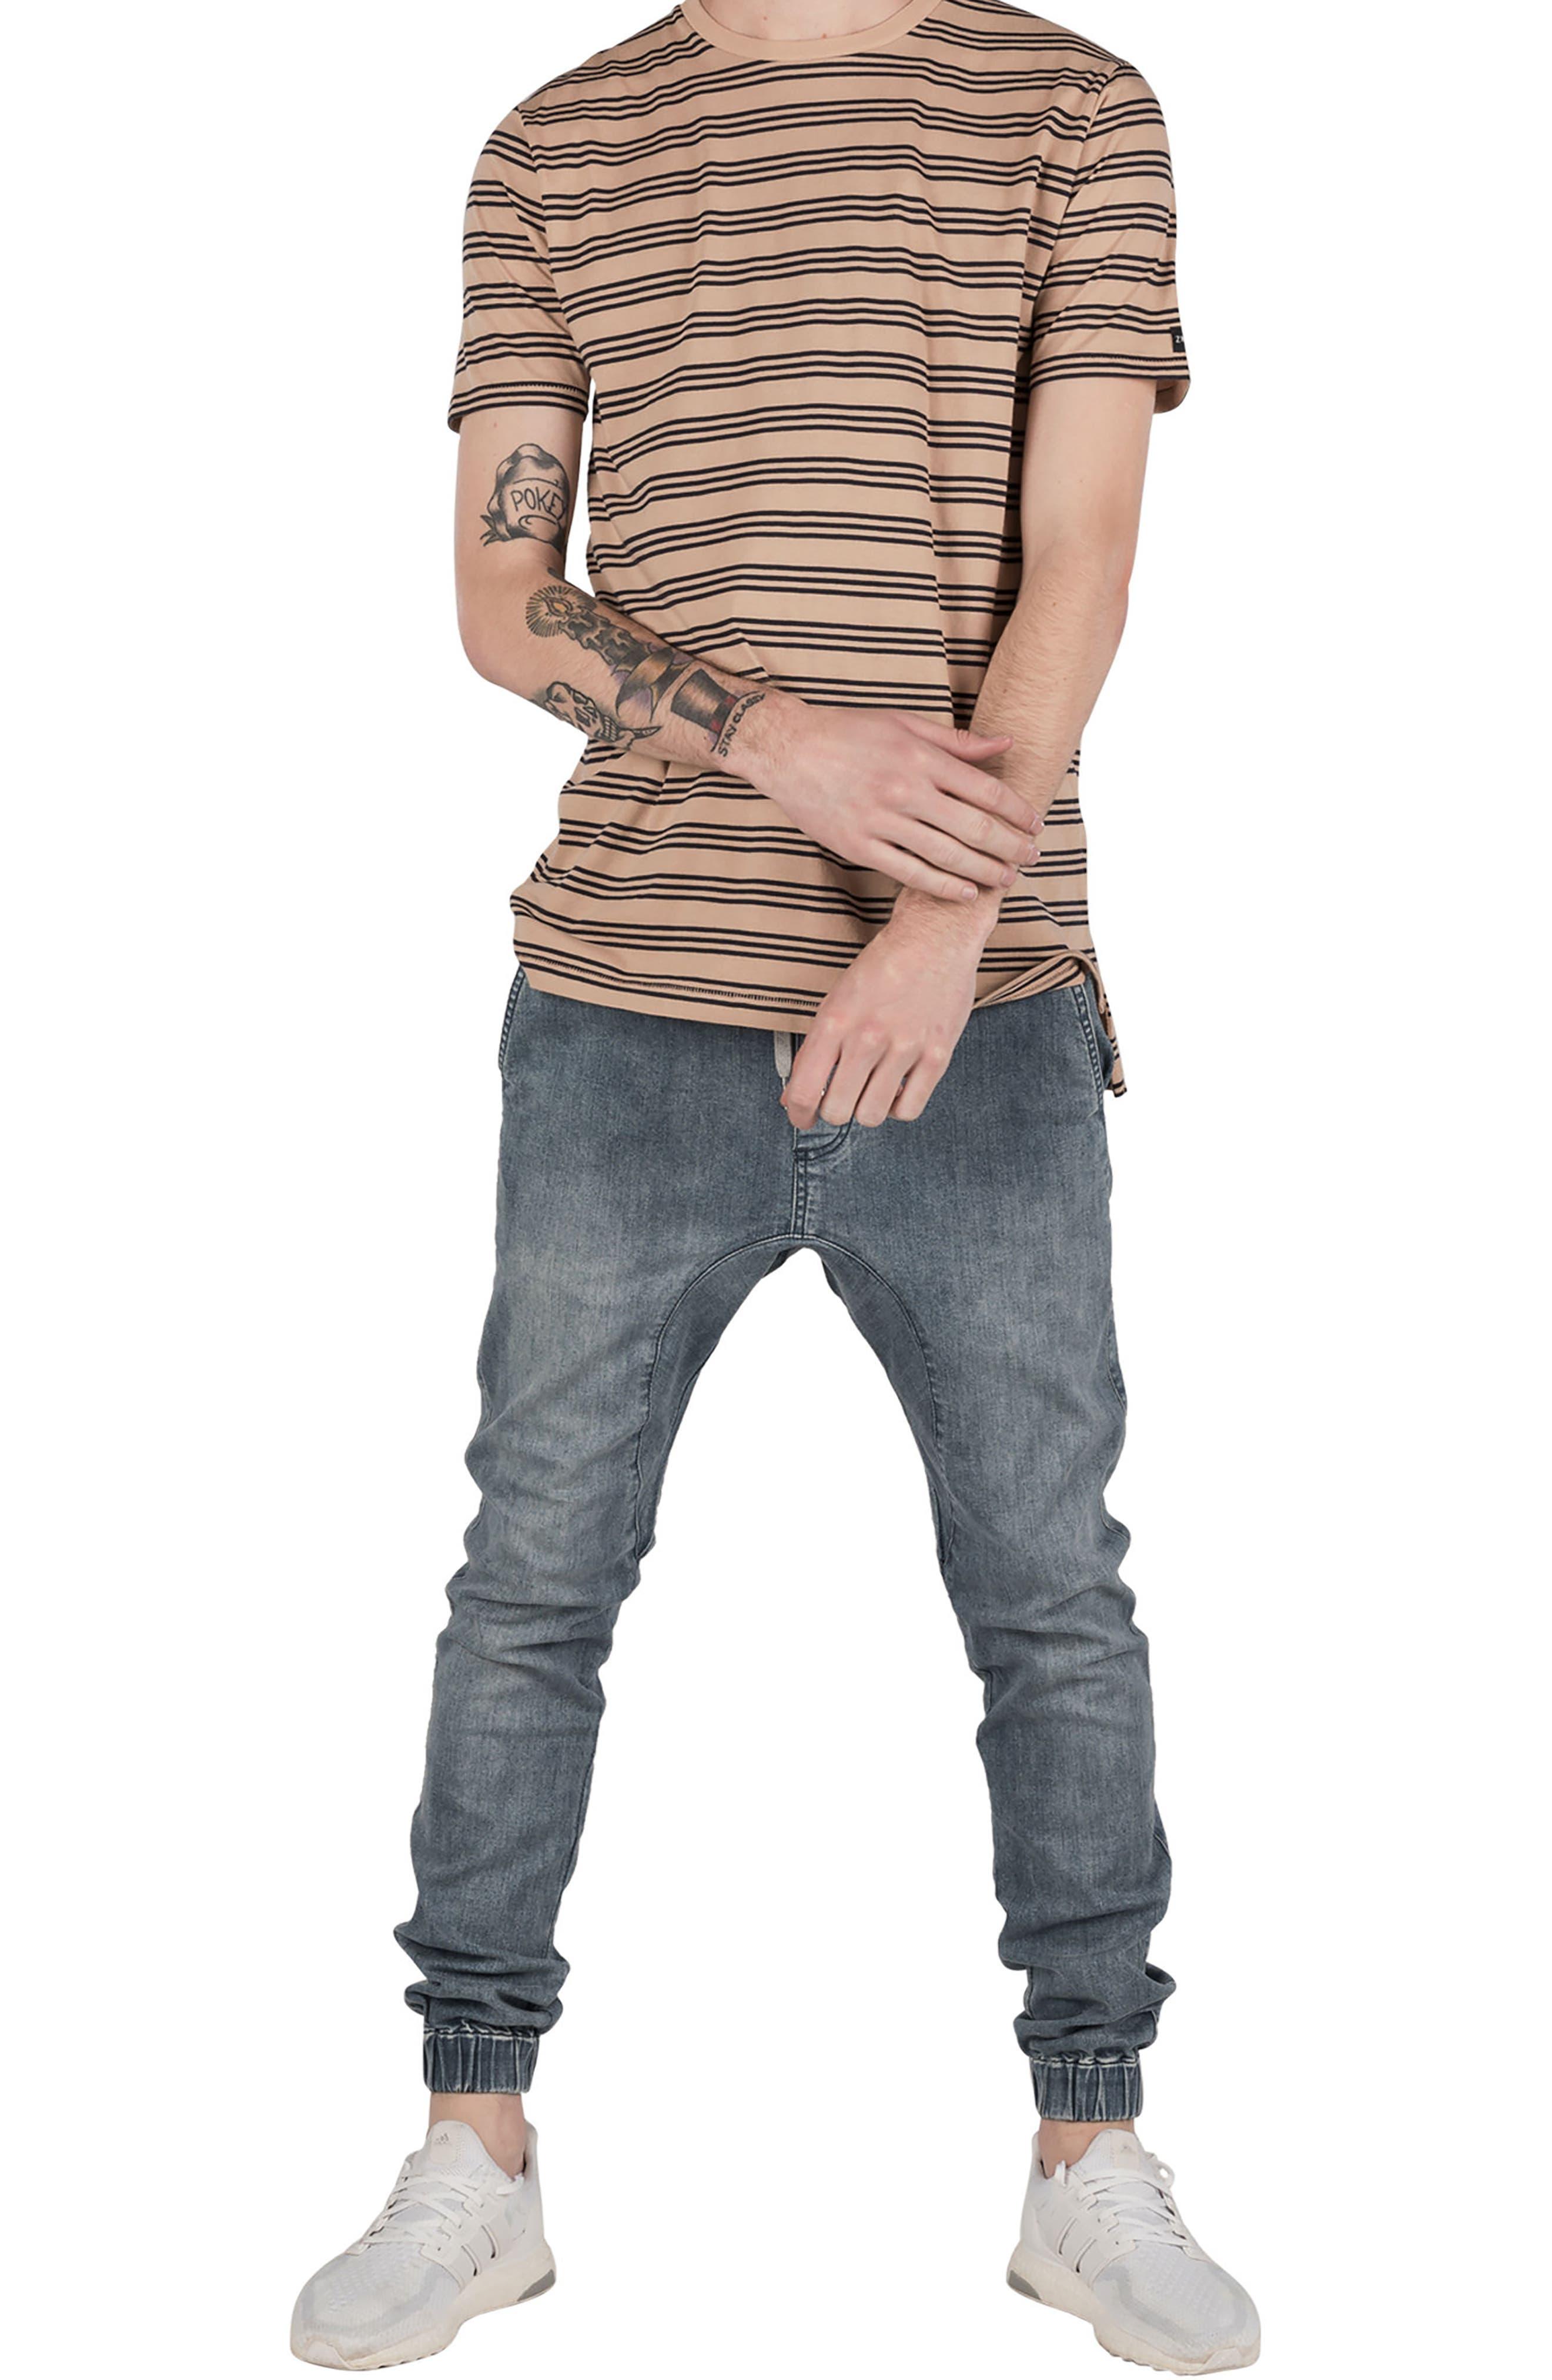 Flintlock Stripe T-Shirt,                             Alternate thumbnail 5, color,                             Wheat/ Navy